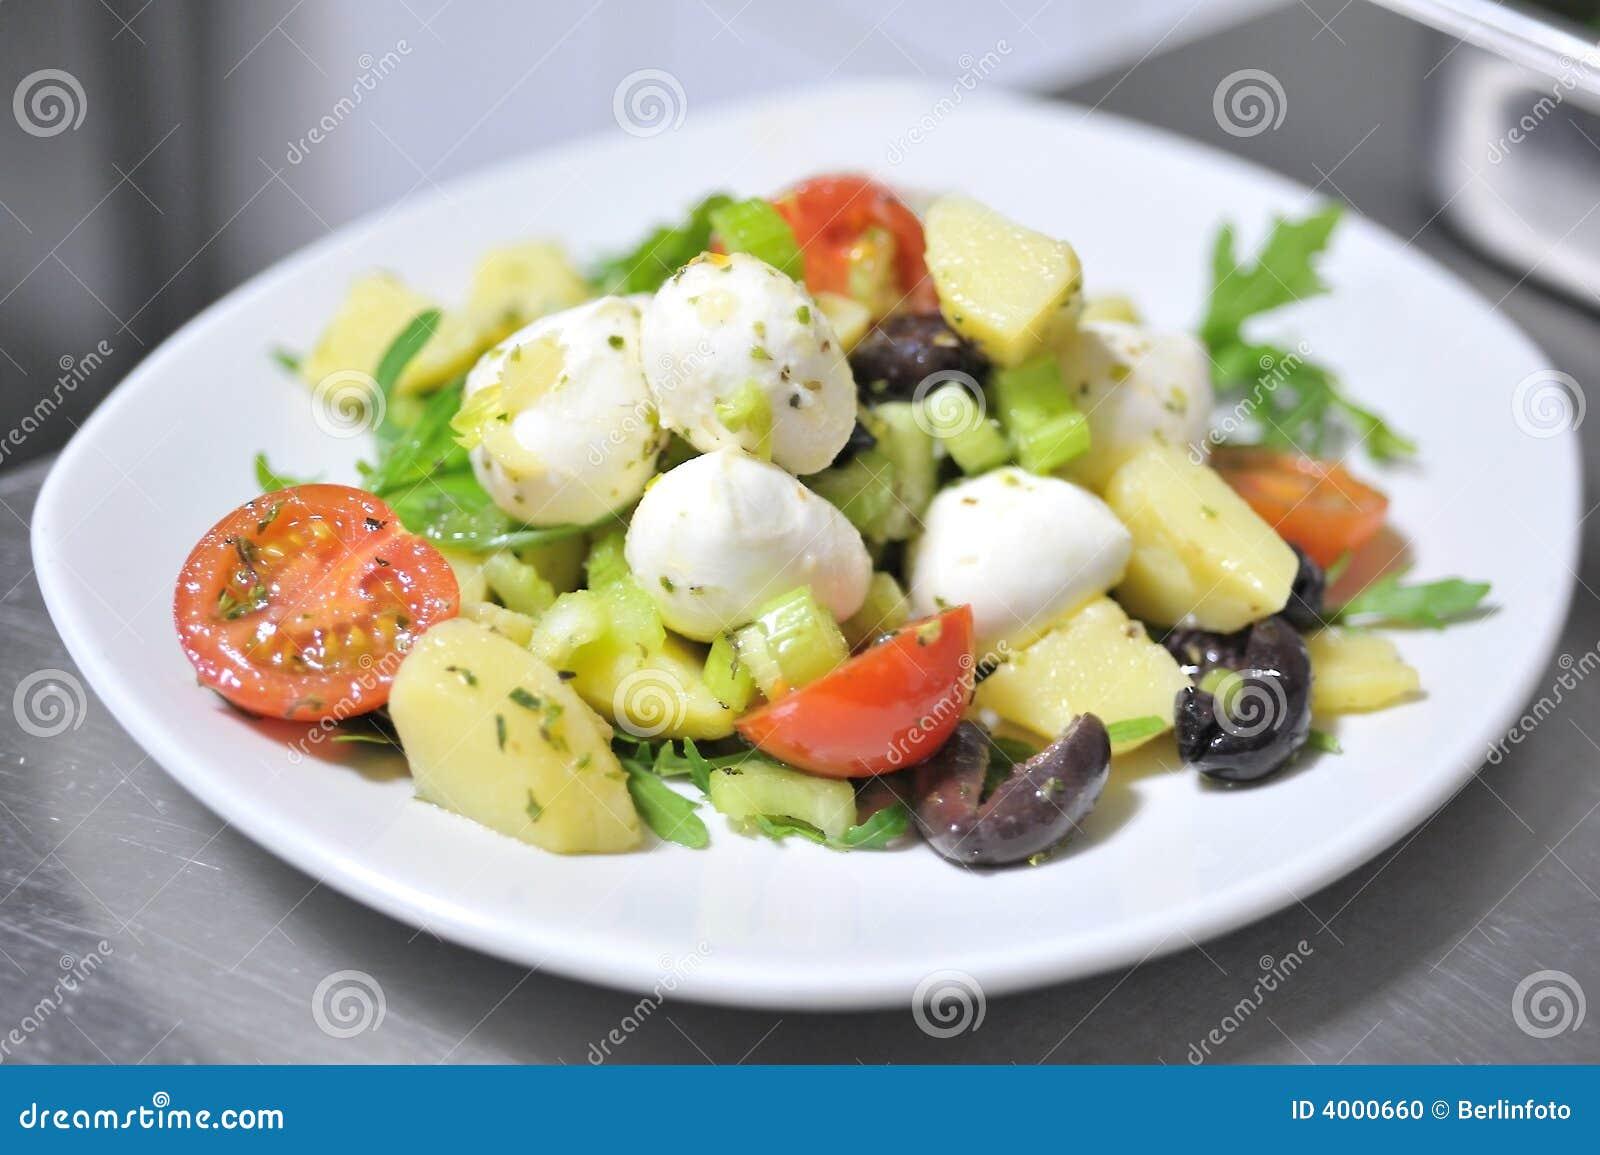 italienischer salat stockfoto bild 4000660. Black Bedroom Furniture Sets. Home Design Ideas